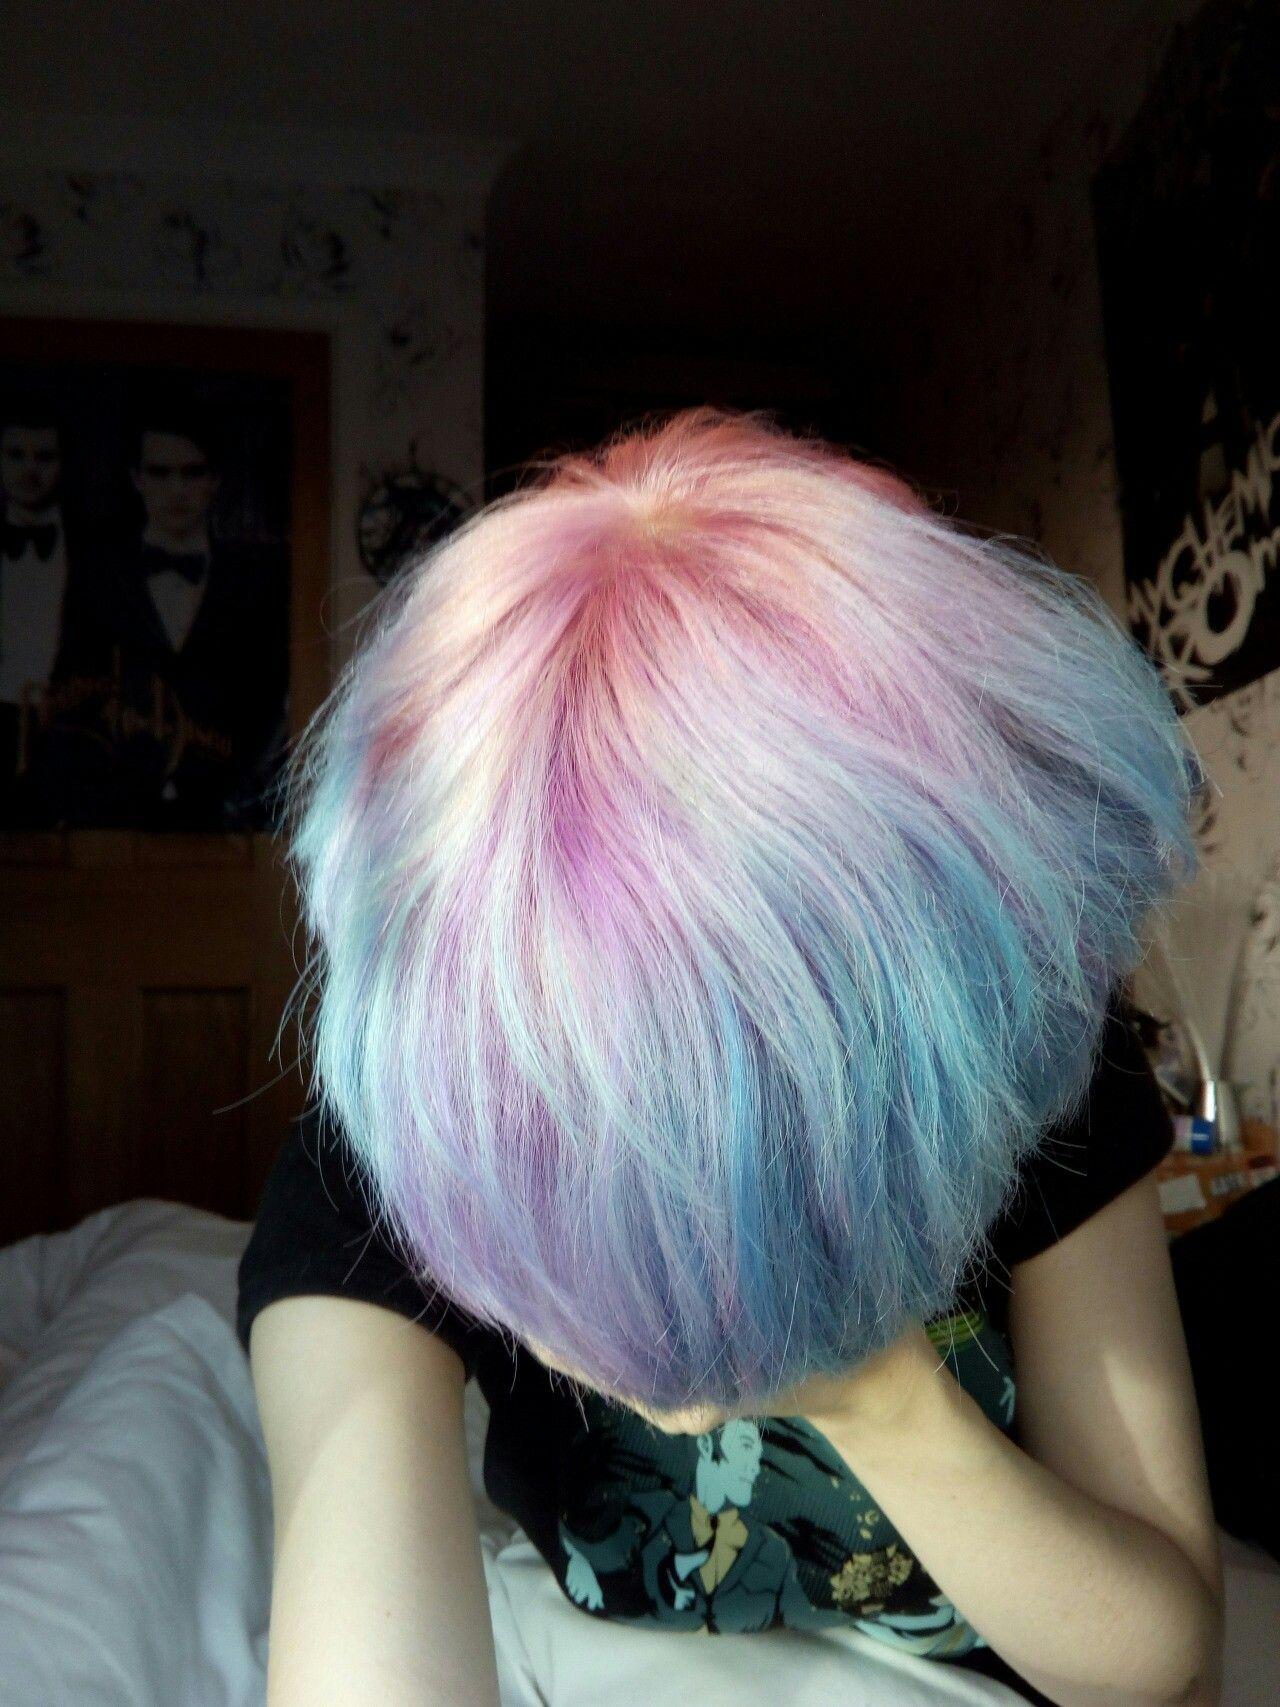 Pin by cambrea lynn on hair pinterest hair coloring pastel hair